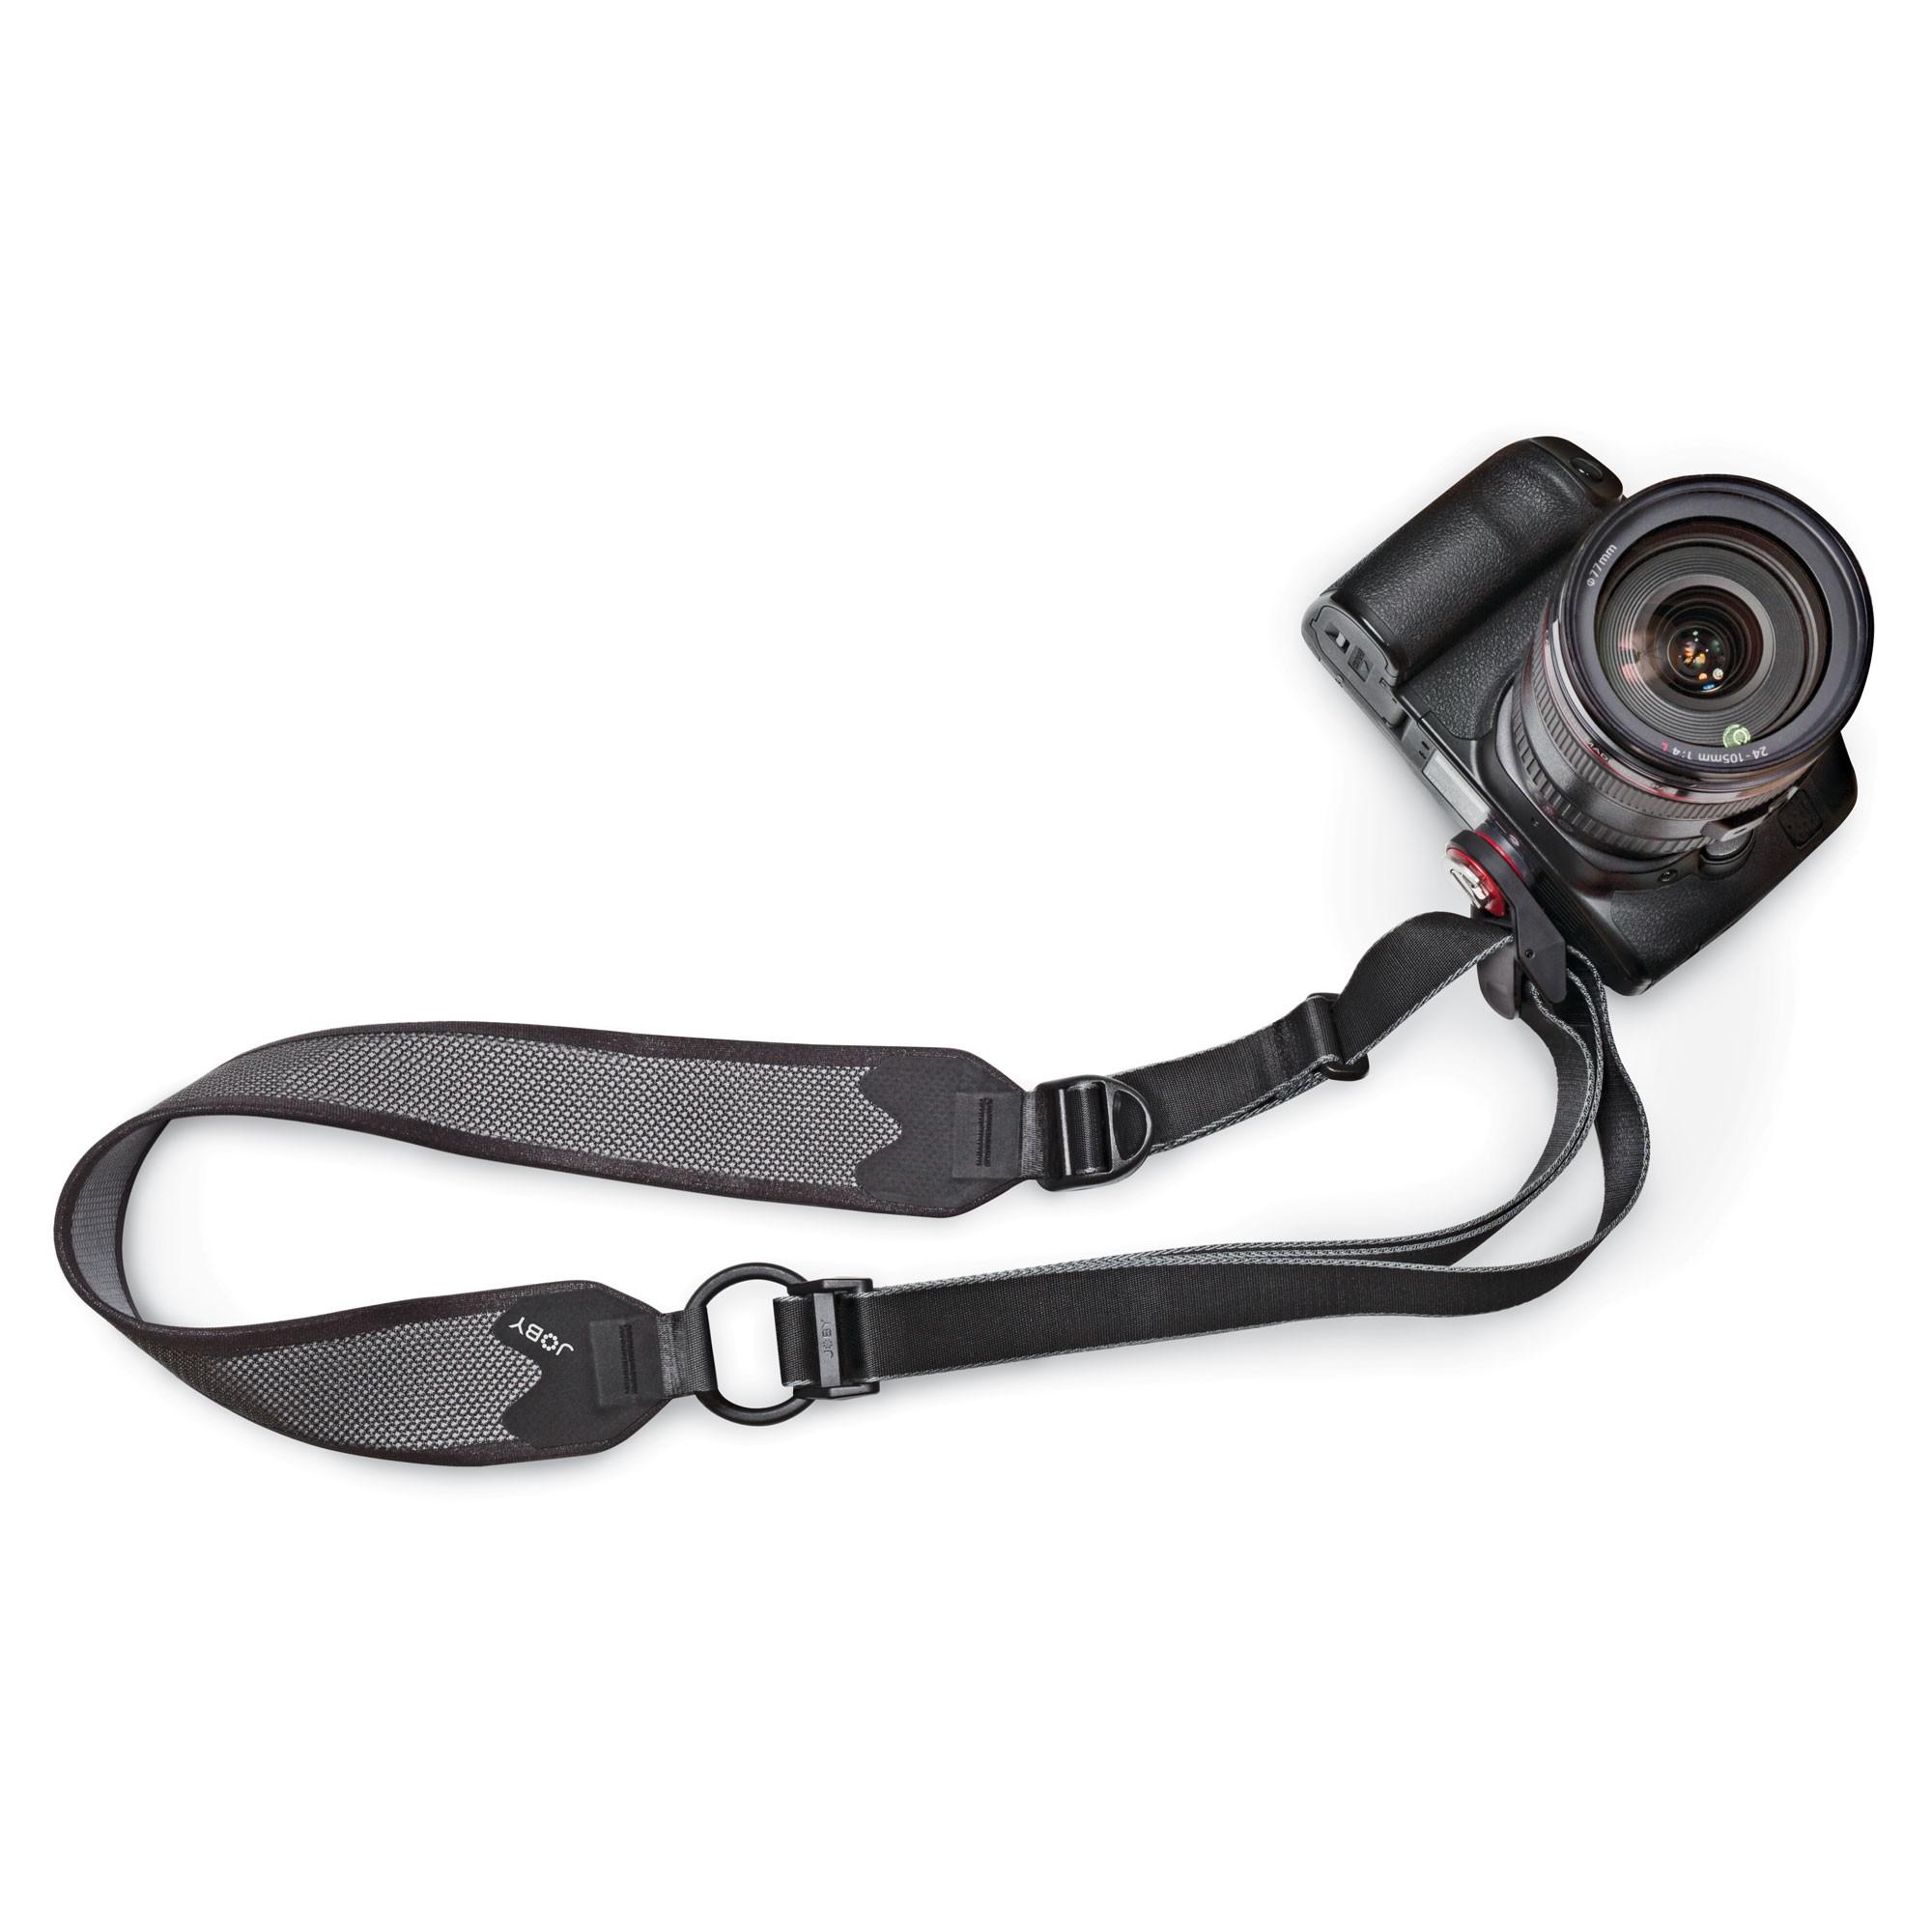 Joby Pro Sling Strap Kens Cameras